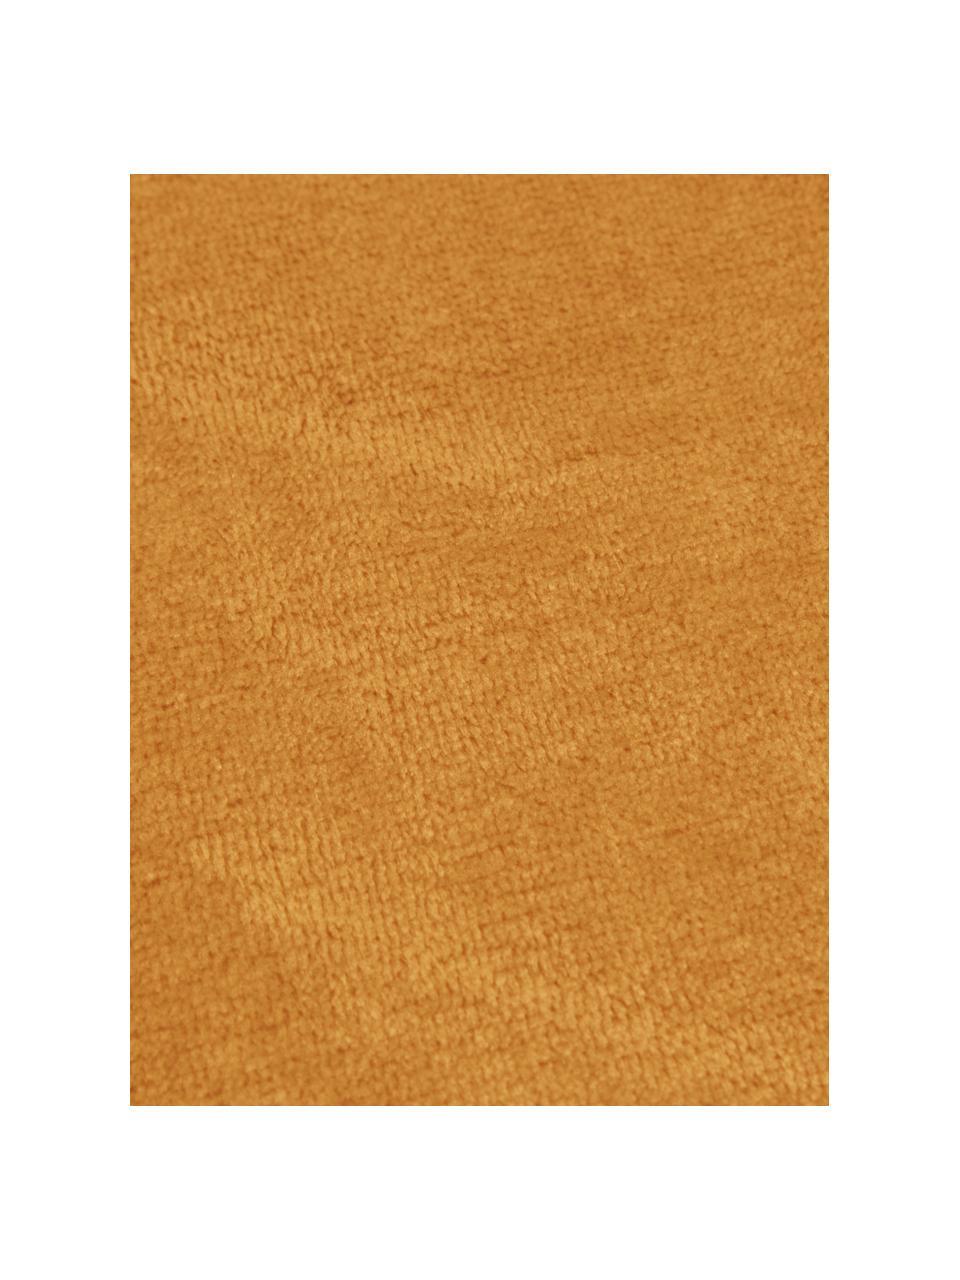 Kuscheldecke Doudou in Senfgelb, 100% Polyester, Senfgelb, 130 x 160 cm